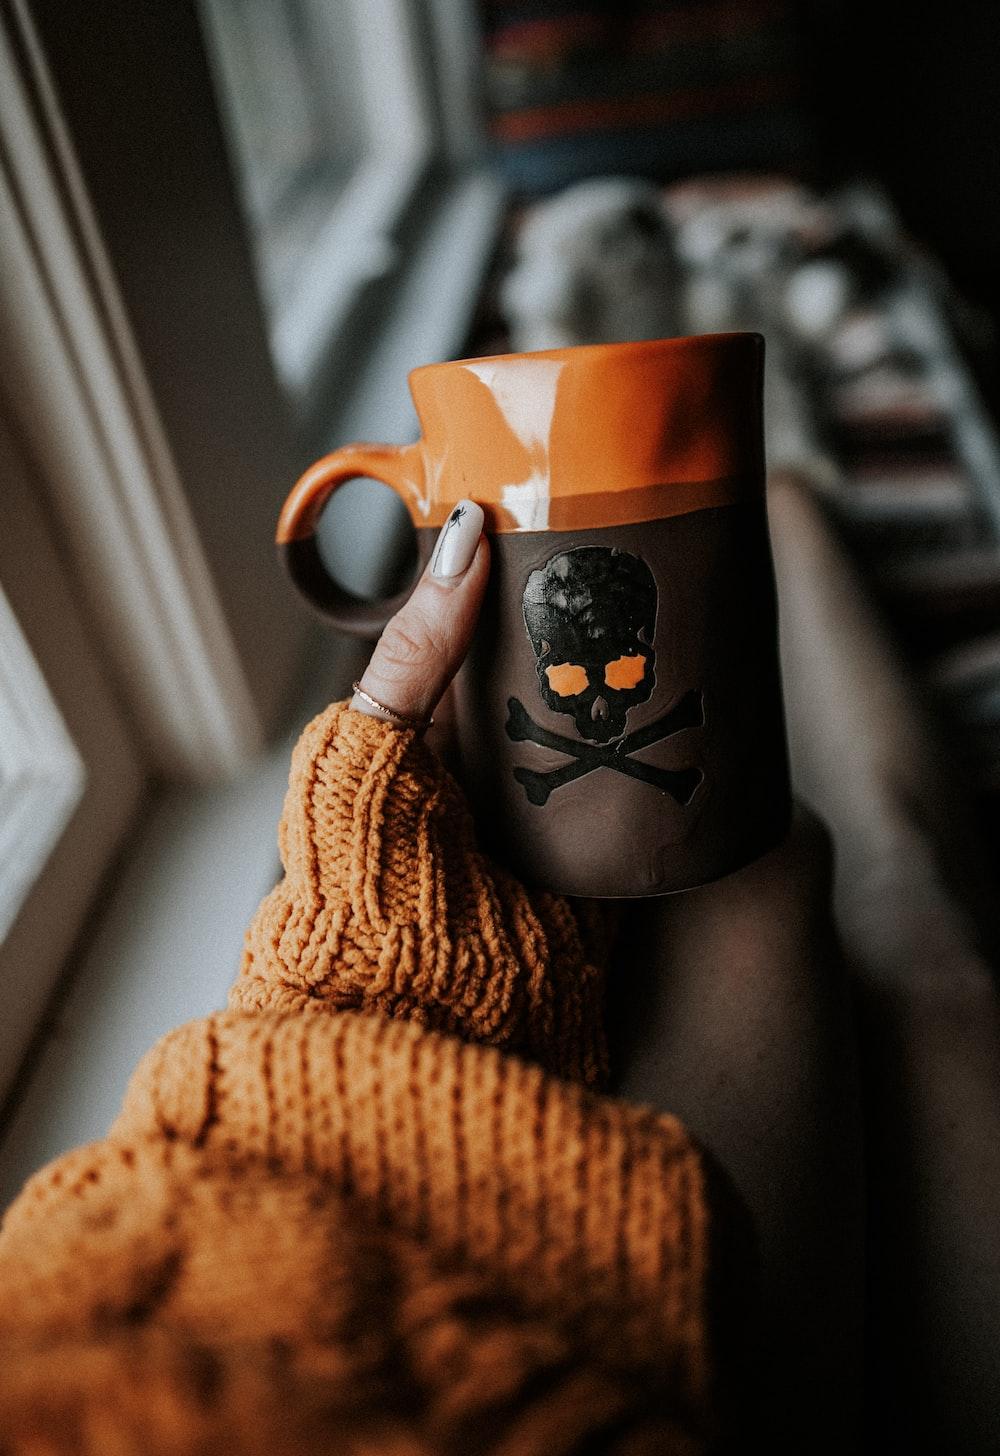 person holding orange and gray skull print ceramic mug